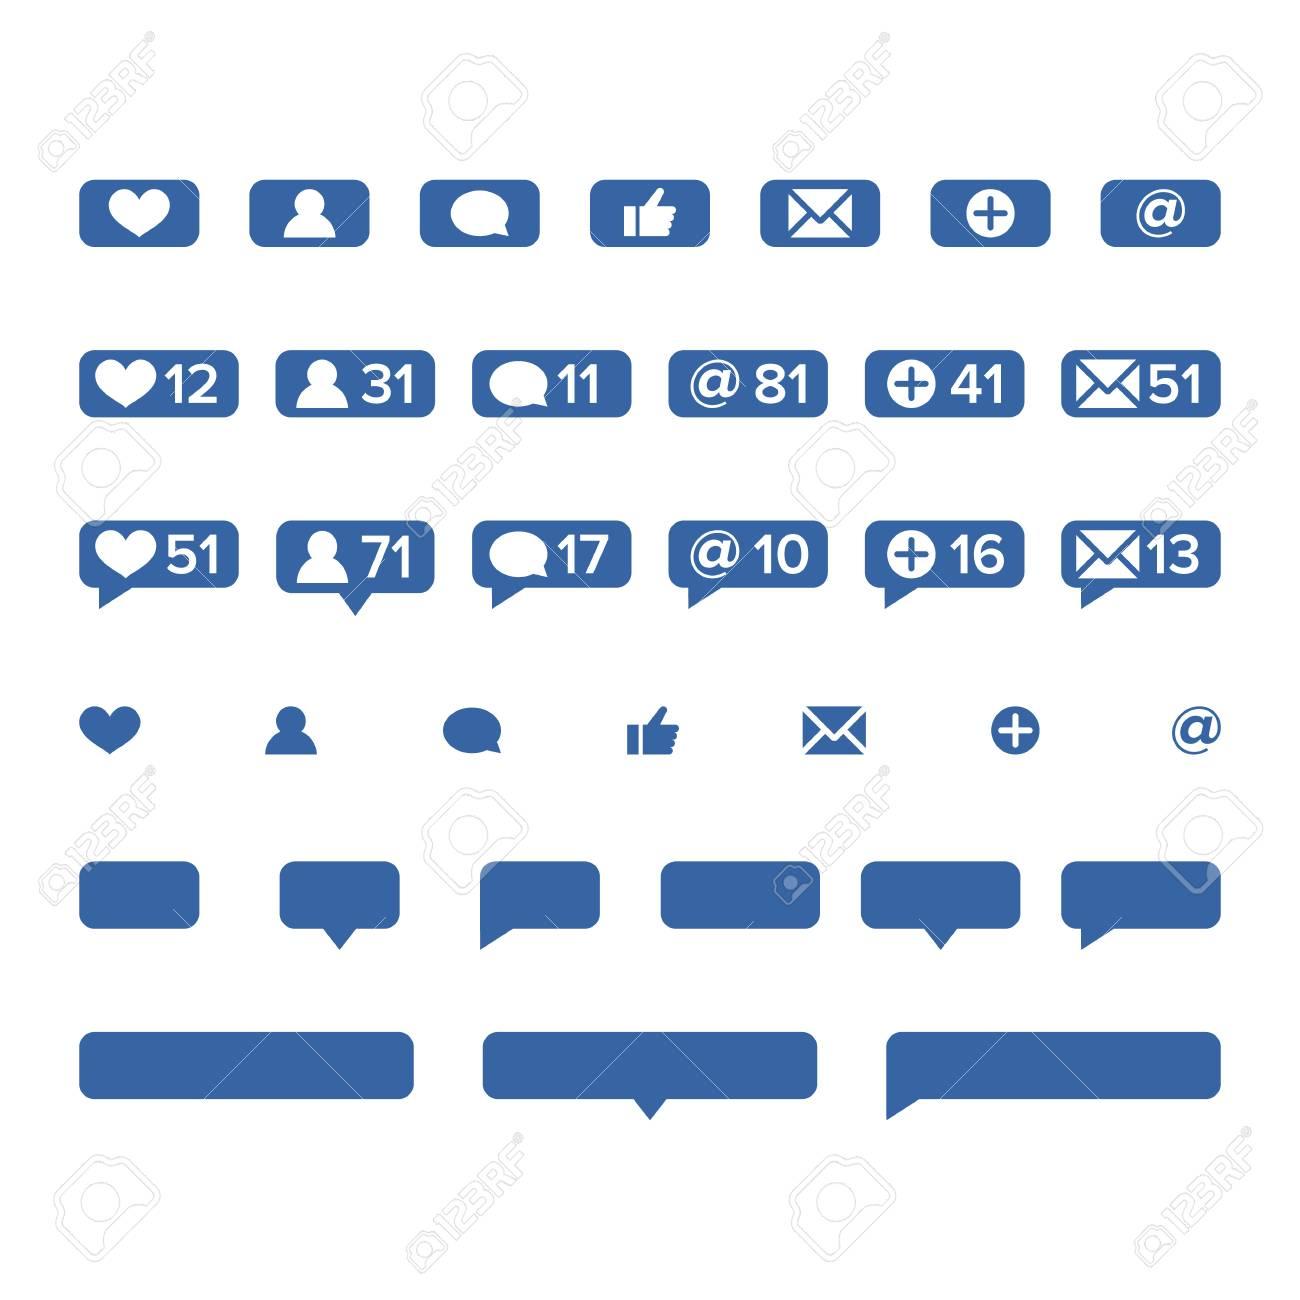 Notifications Icons Template Vector. Social Network App Symbols ...